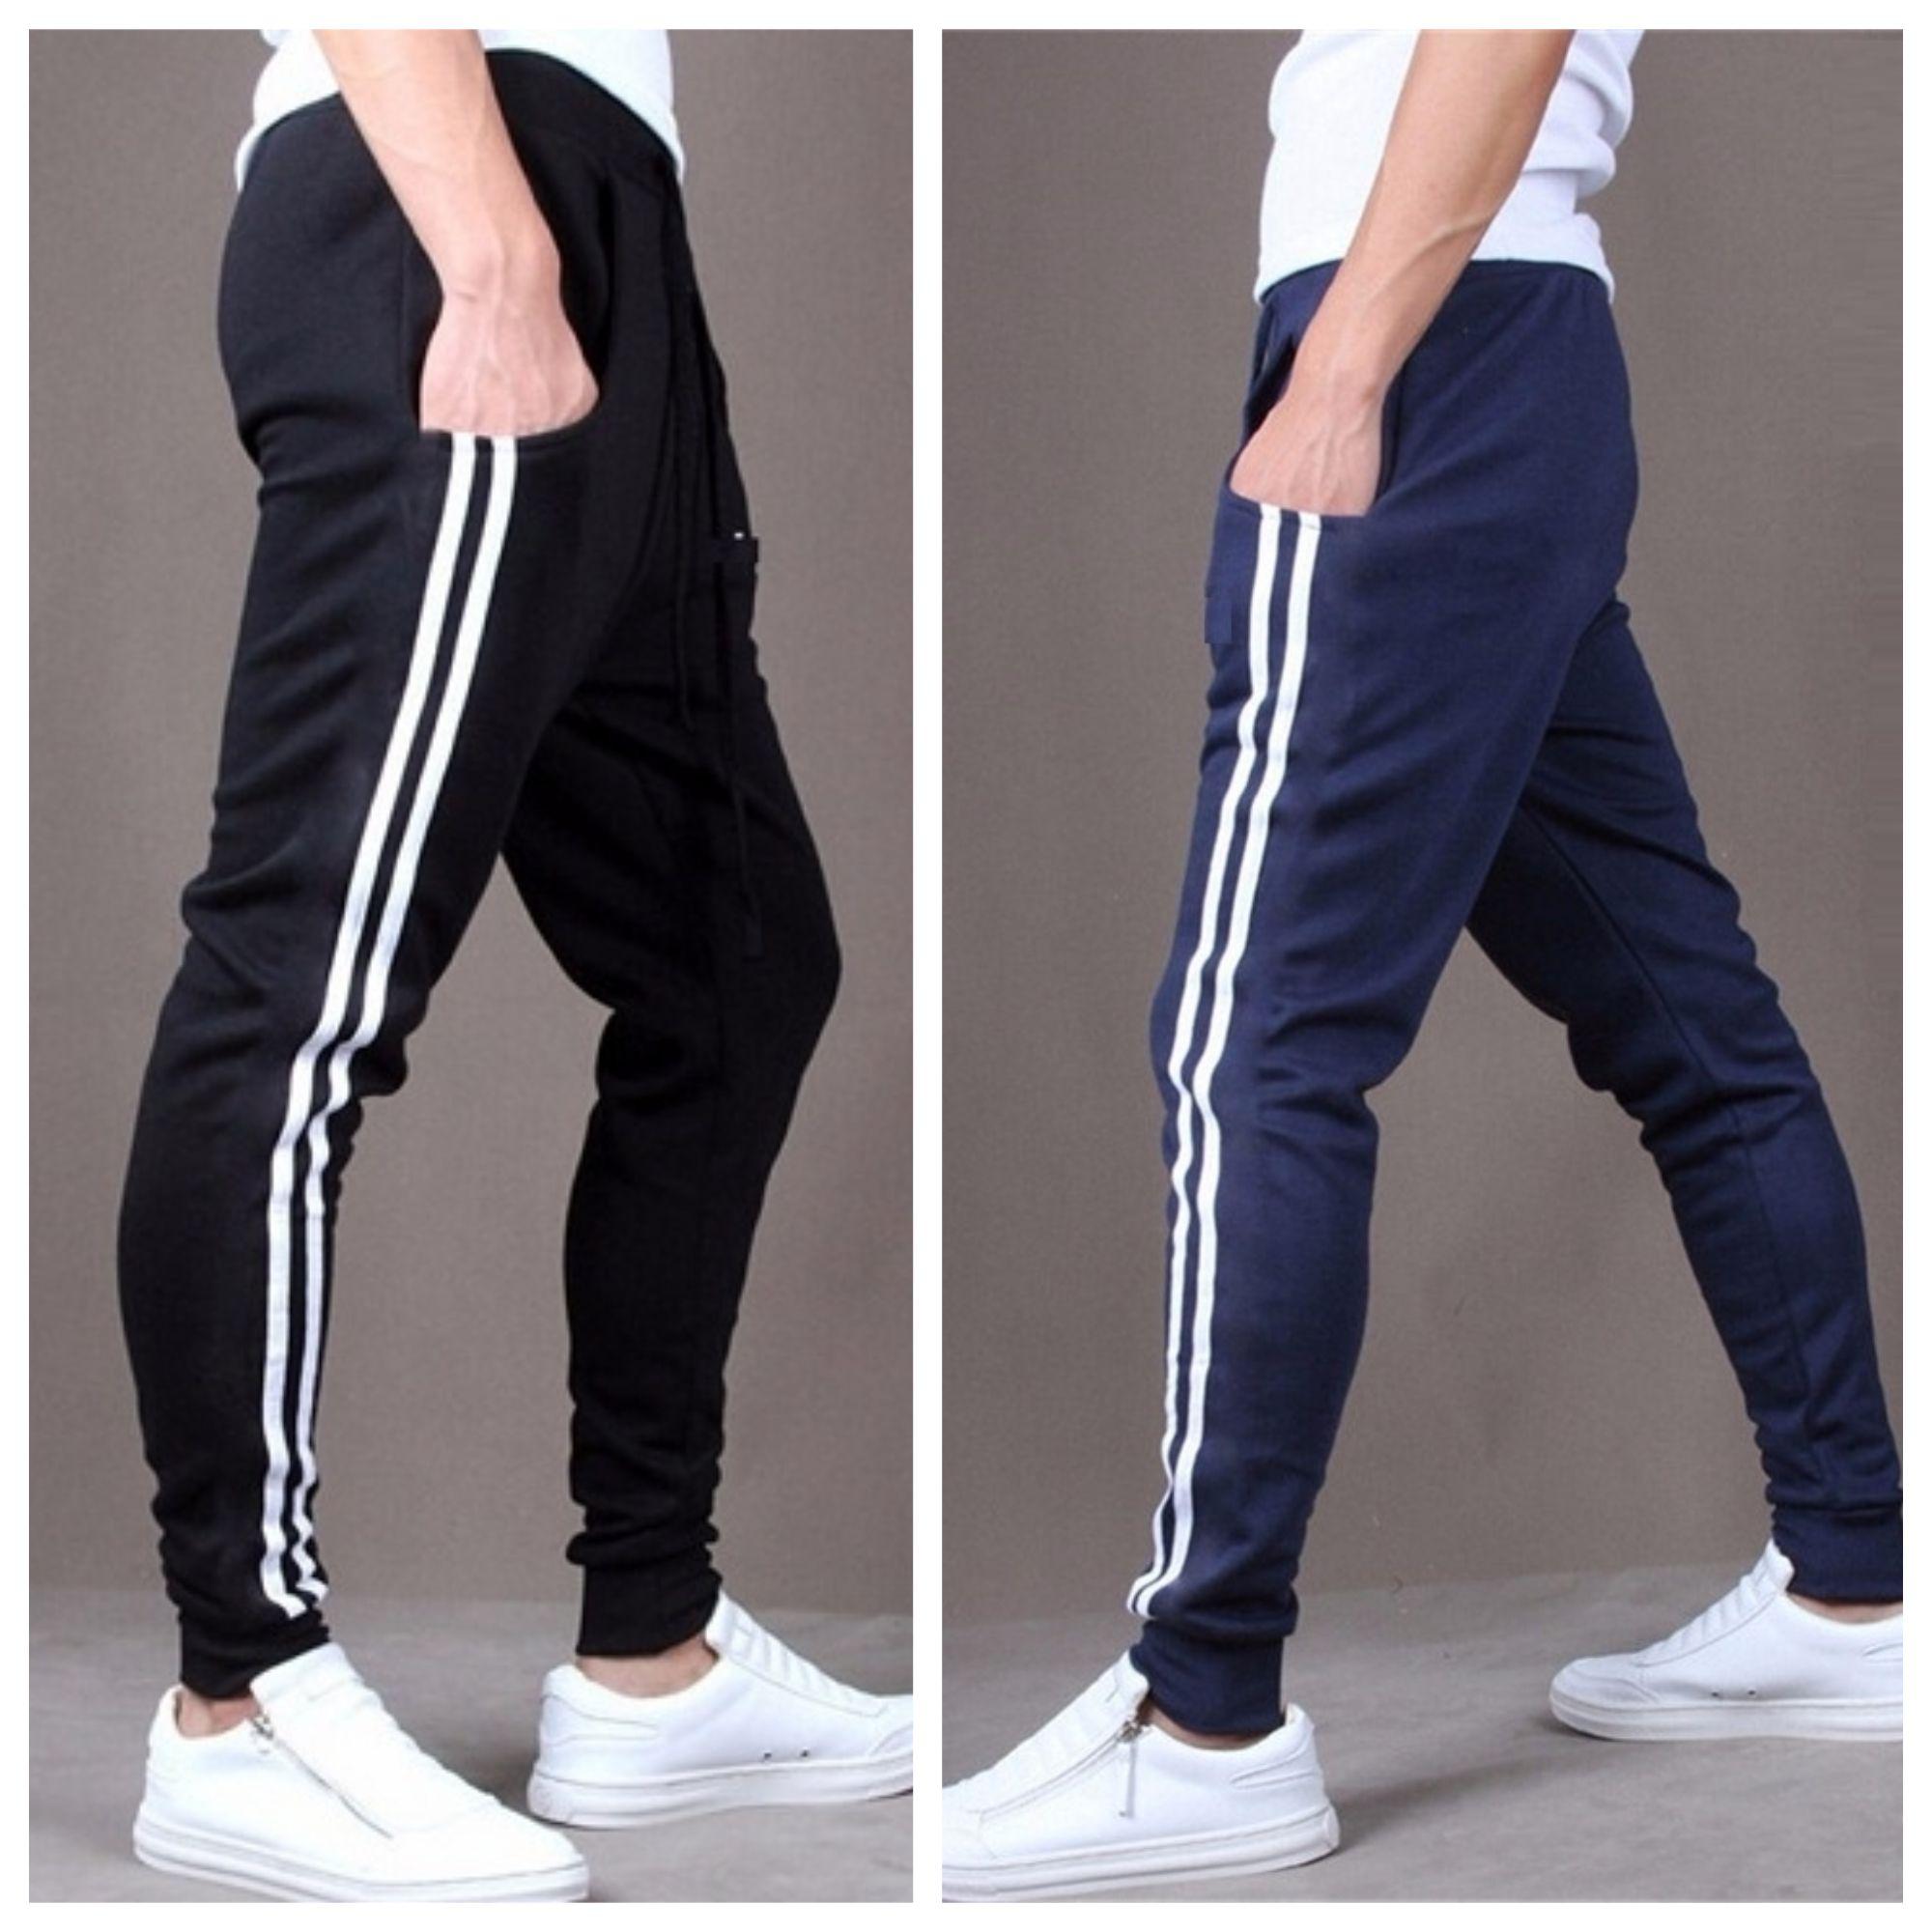 Joggers Park Combo Of 2 Men's Fashion Casual Skinny Sports Black Blue Track Pants